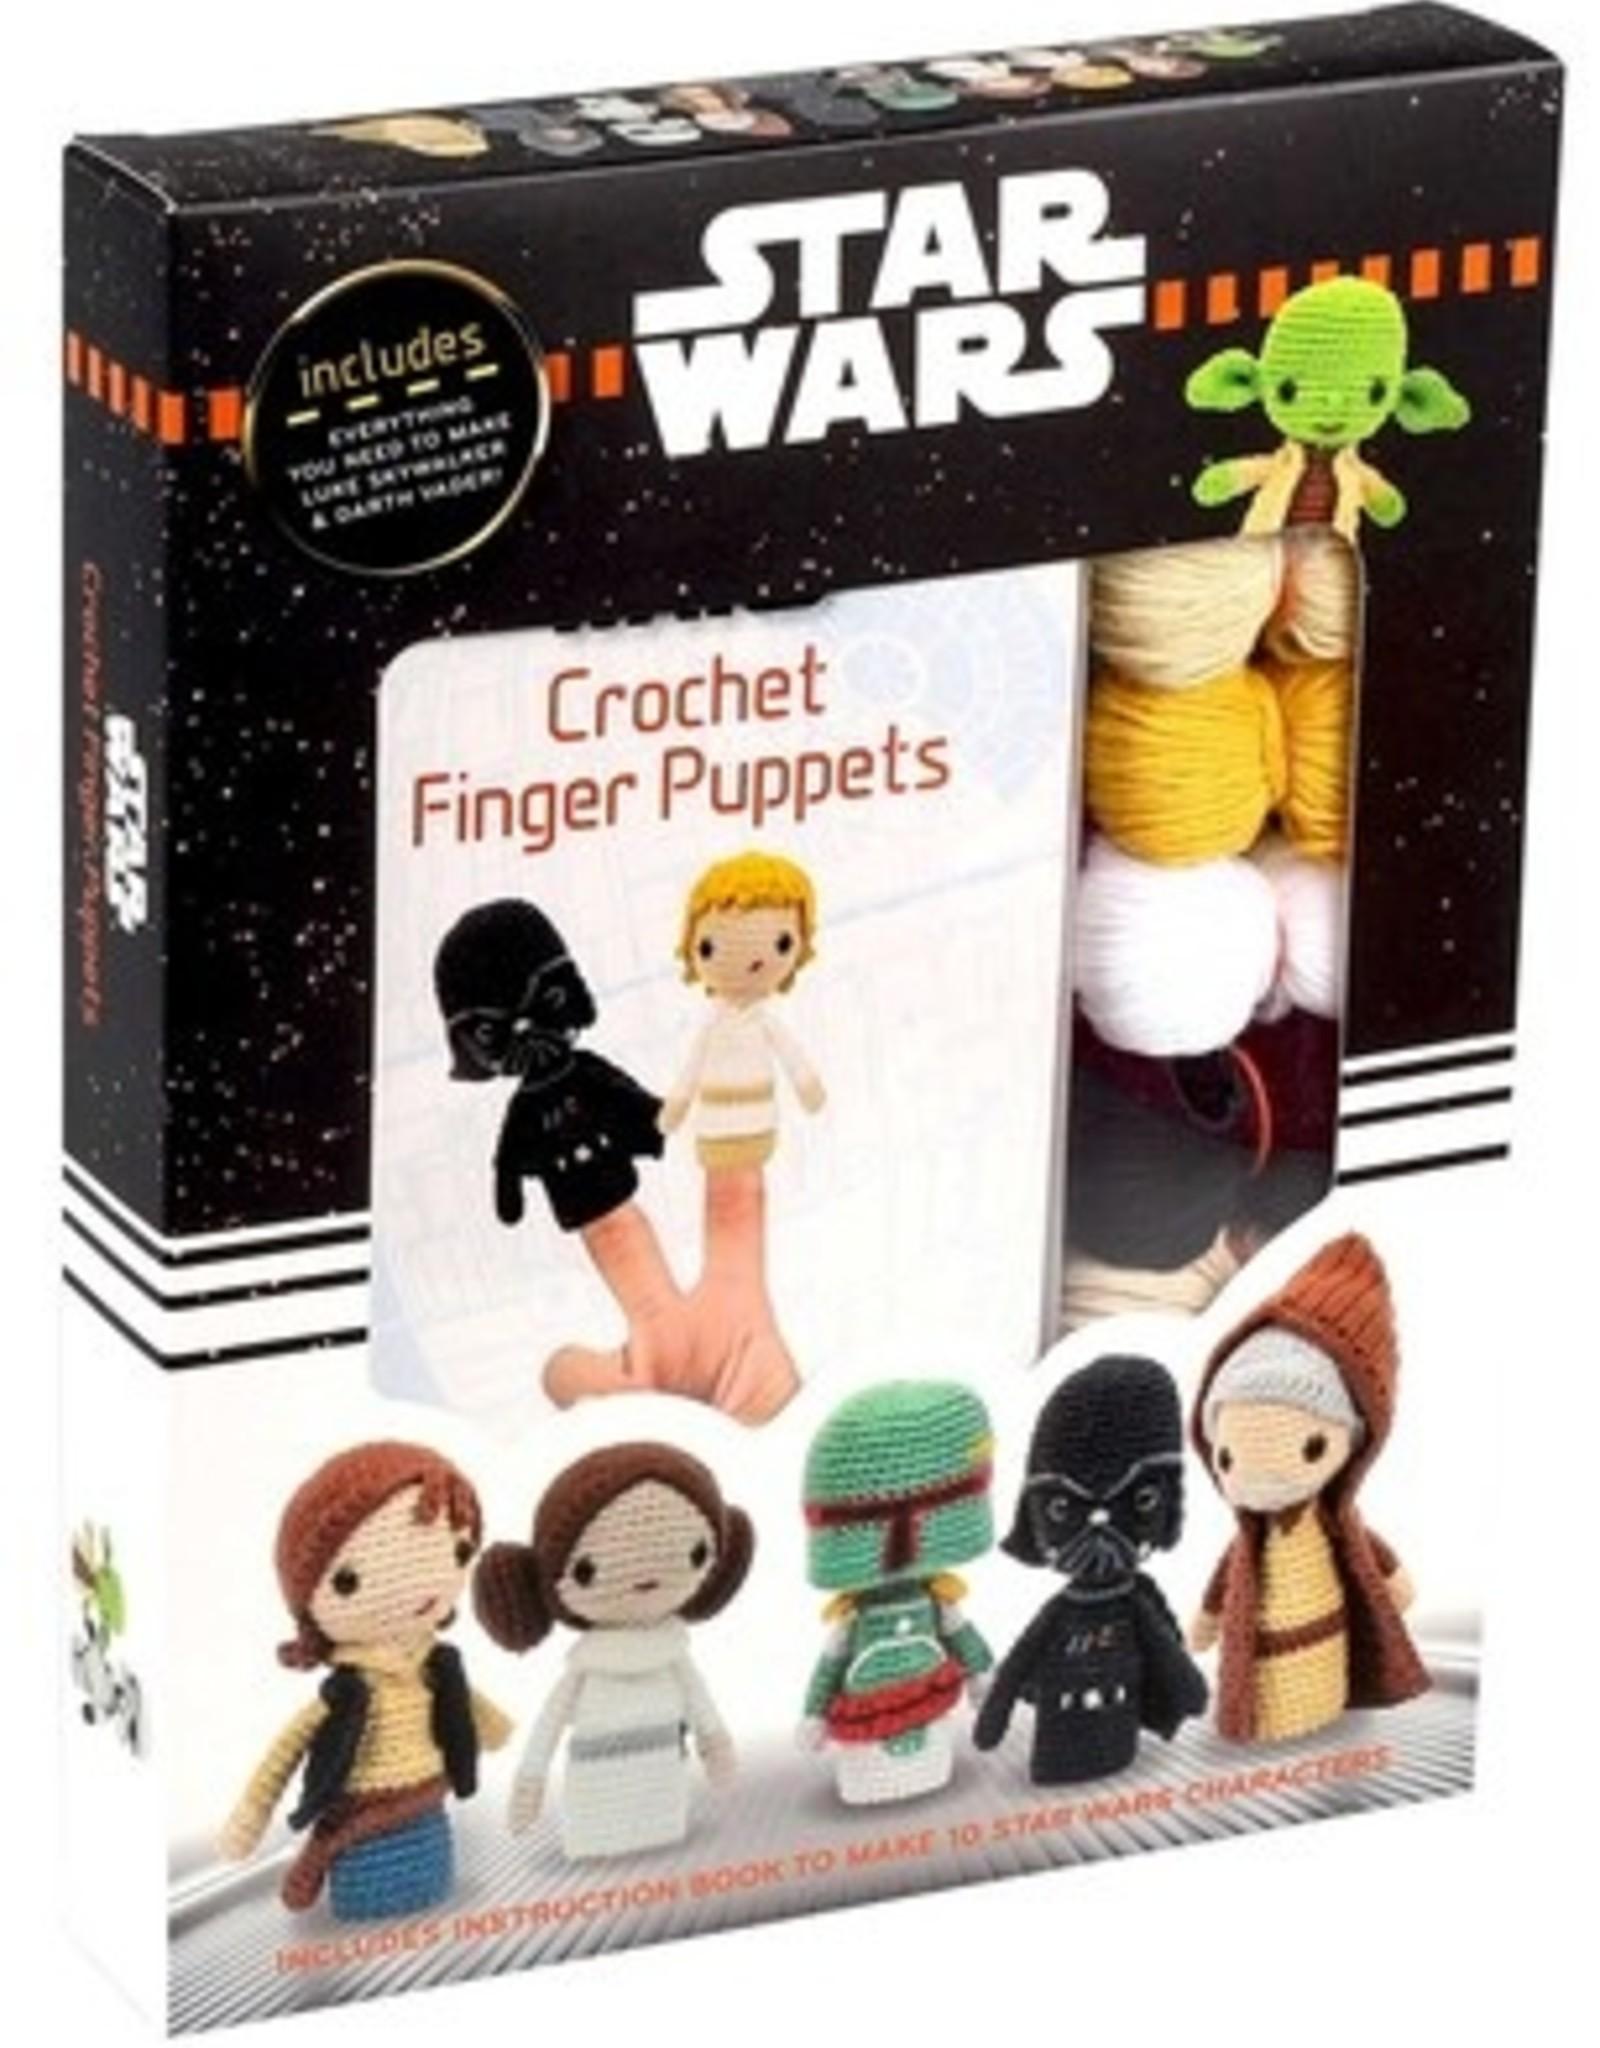 Star Wars Crochet Finger Puppets